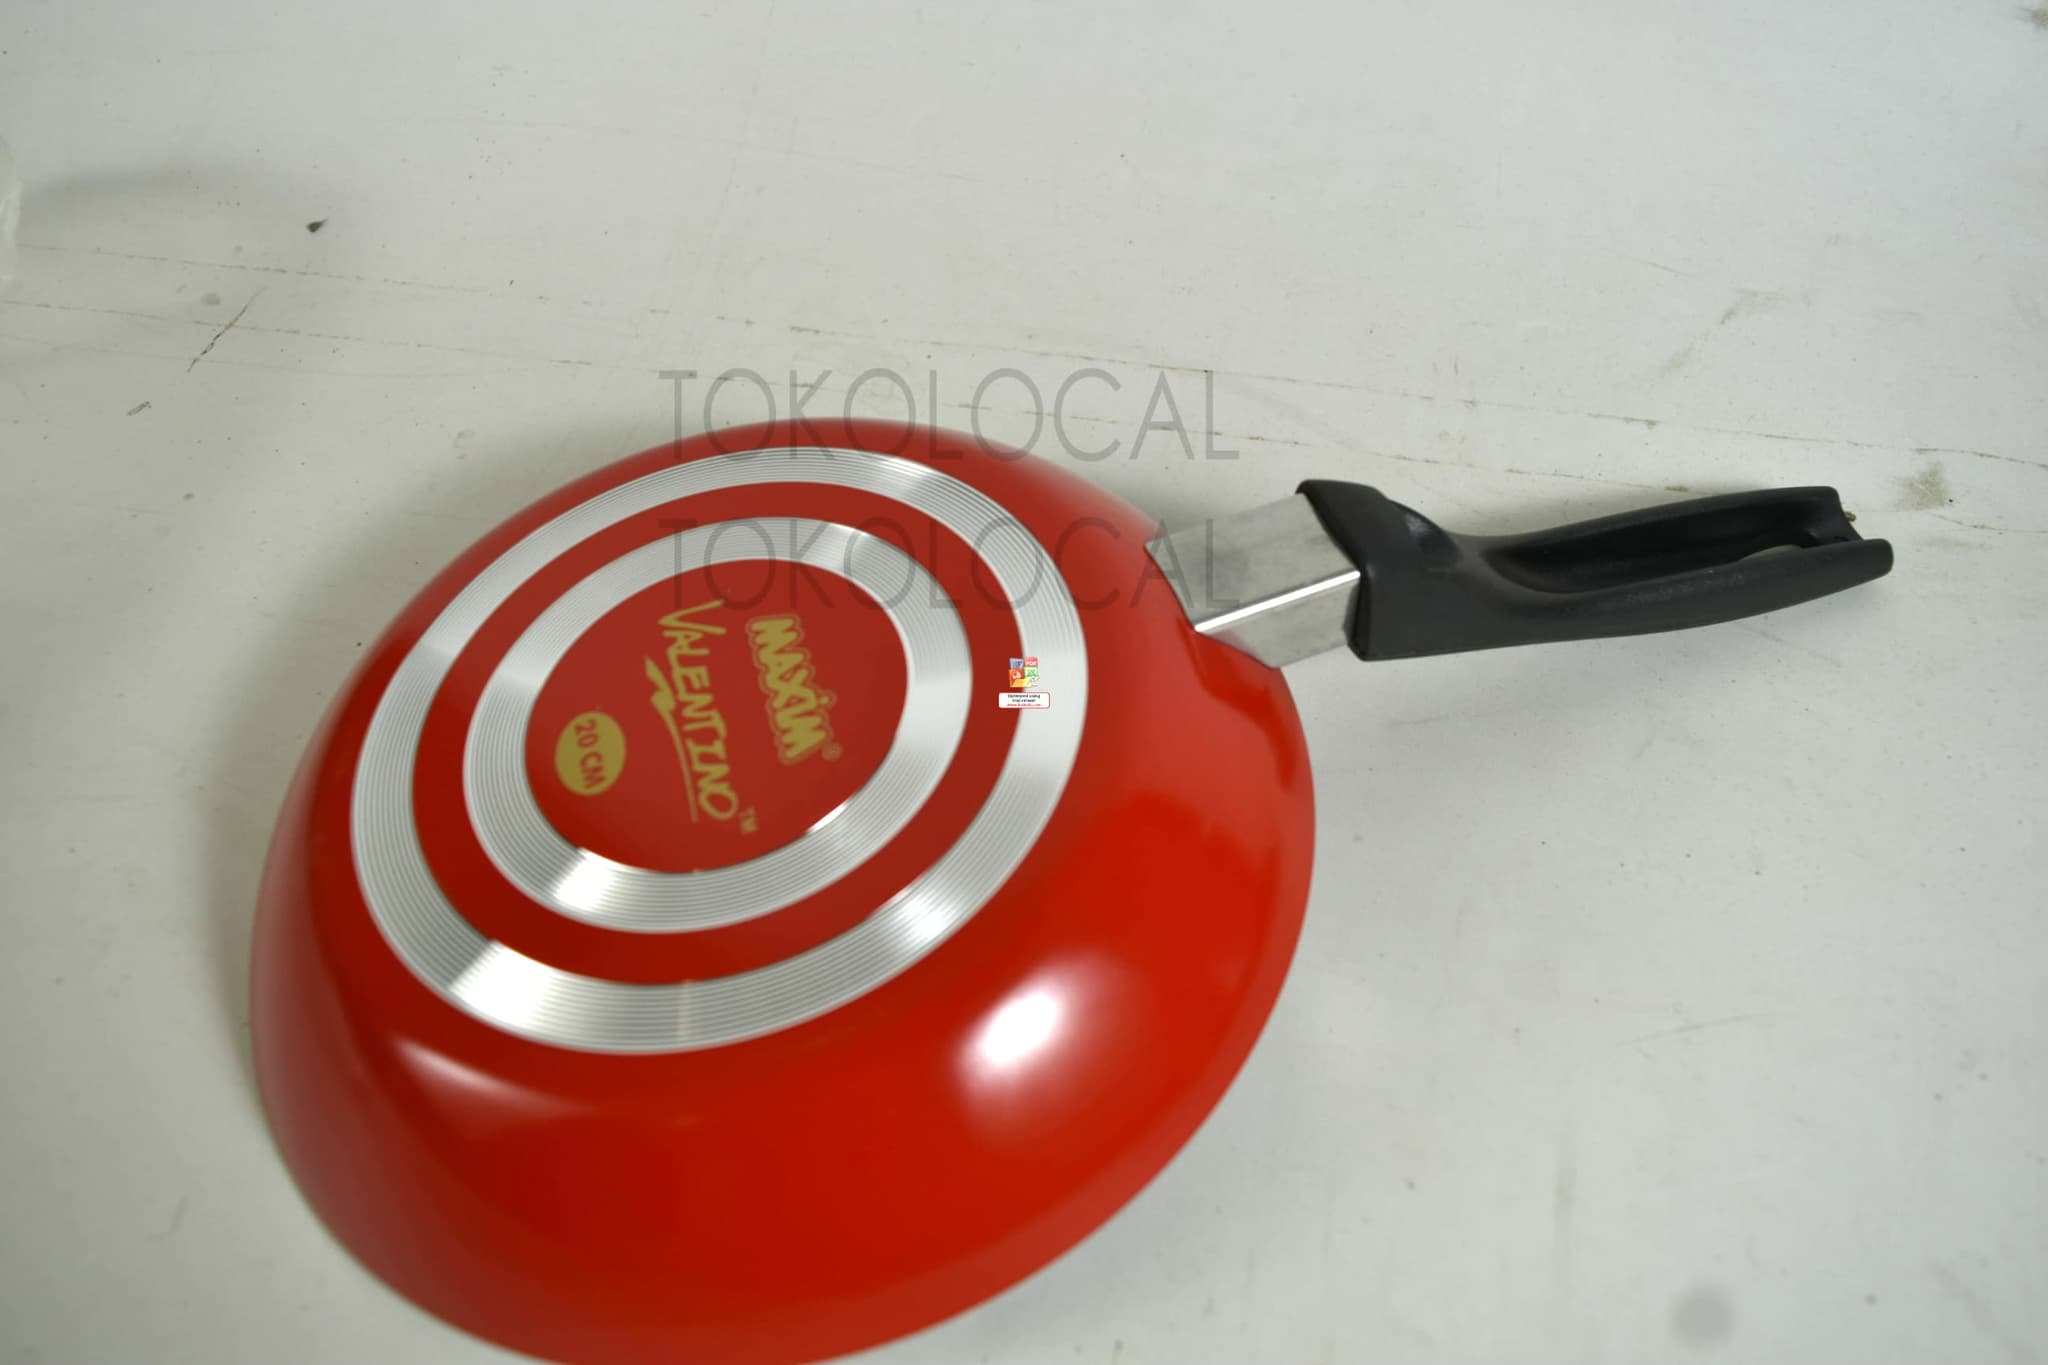 Fitur Original Wajan Penggorengan Fry Pan Teflon 20 Cm Hello Source · 37322594 9801260f ac1d 44c6 af2e b64ac62446e8 2048 1365 jpg